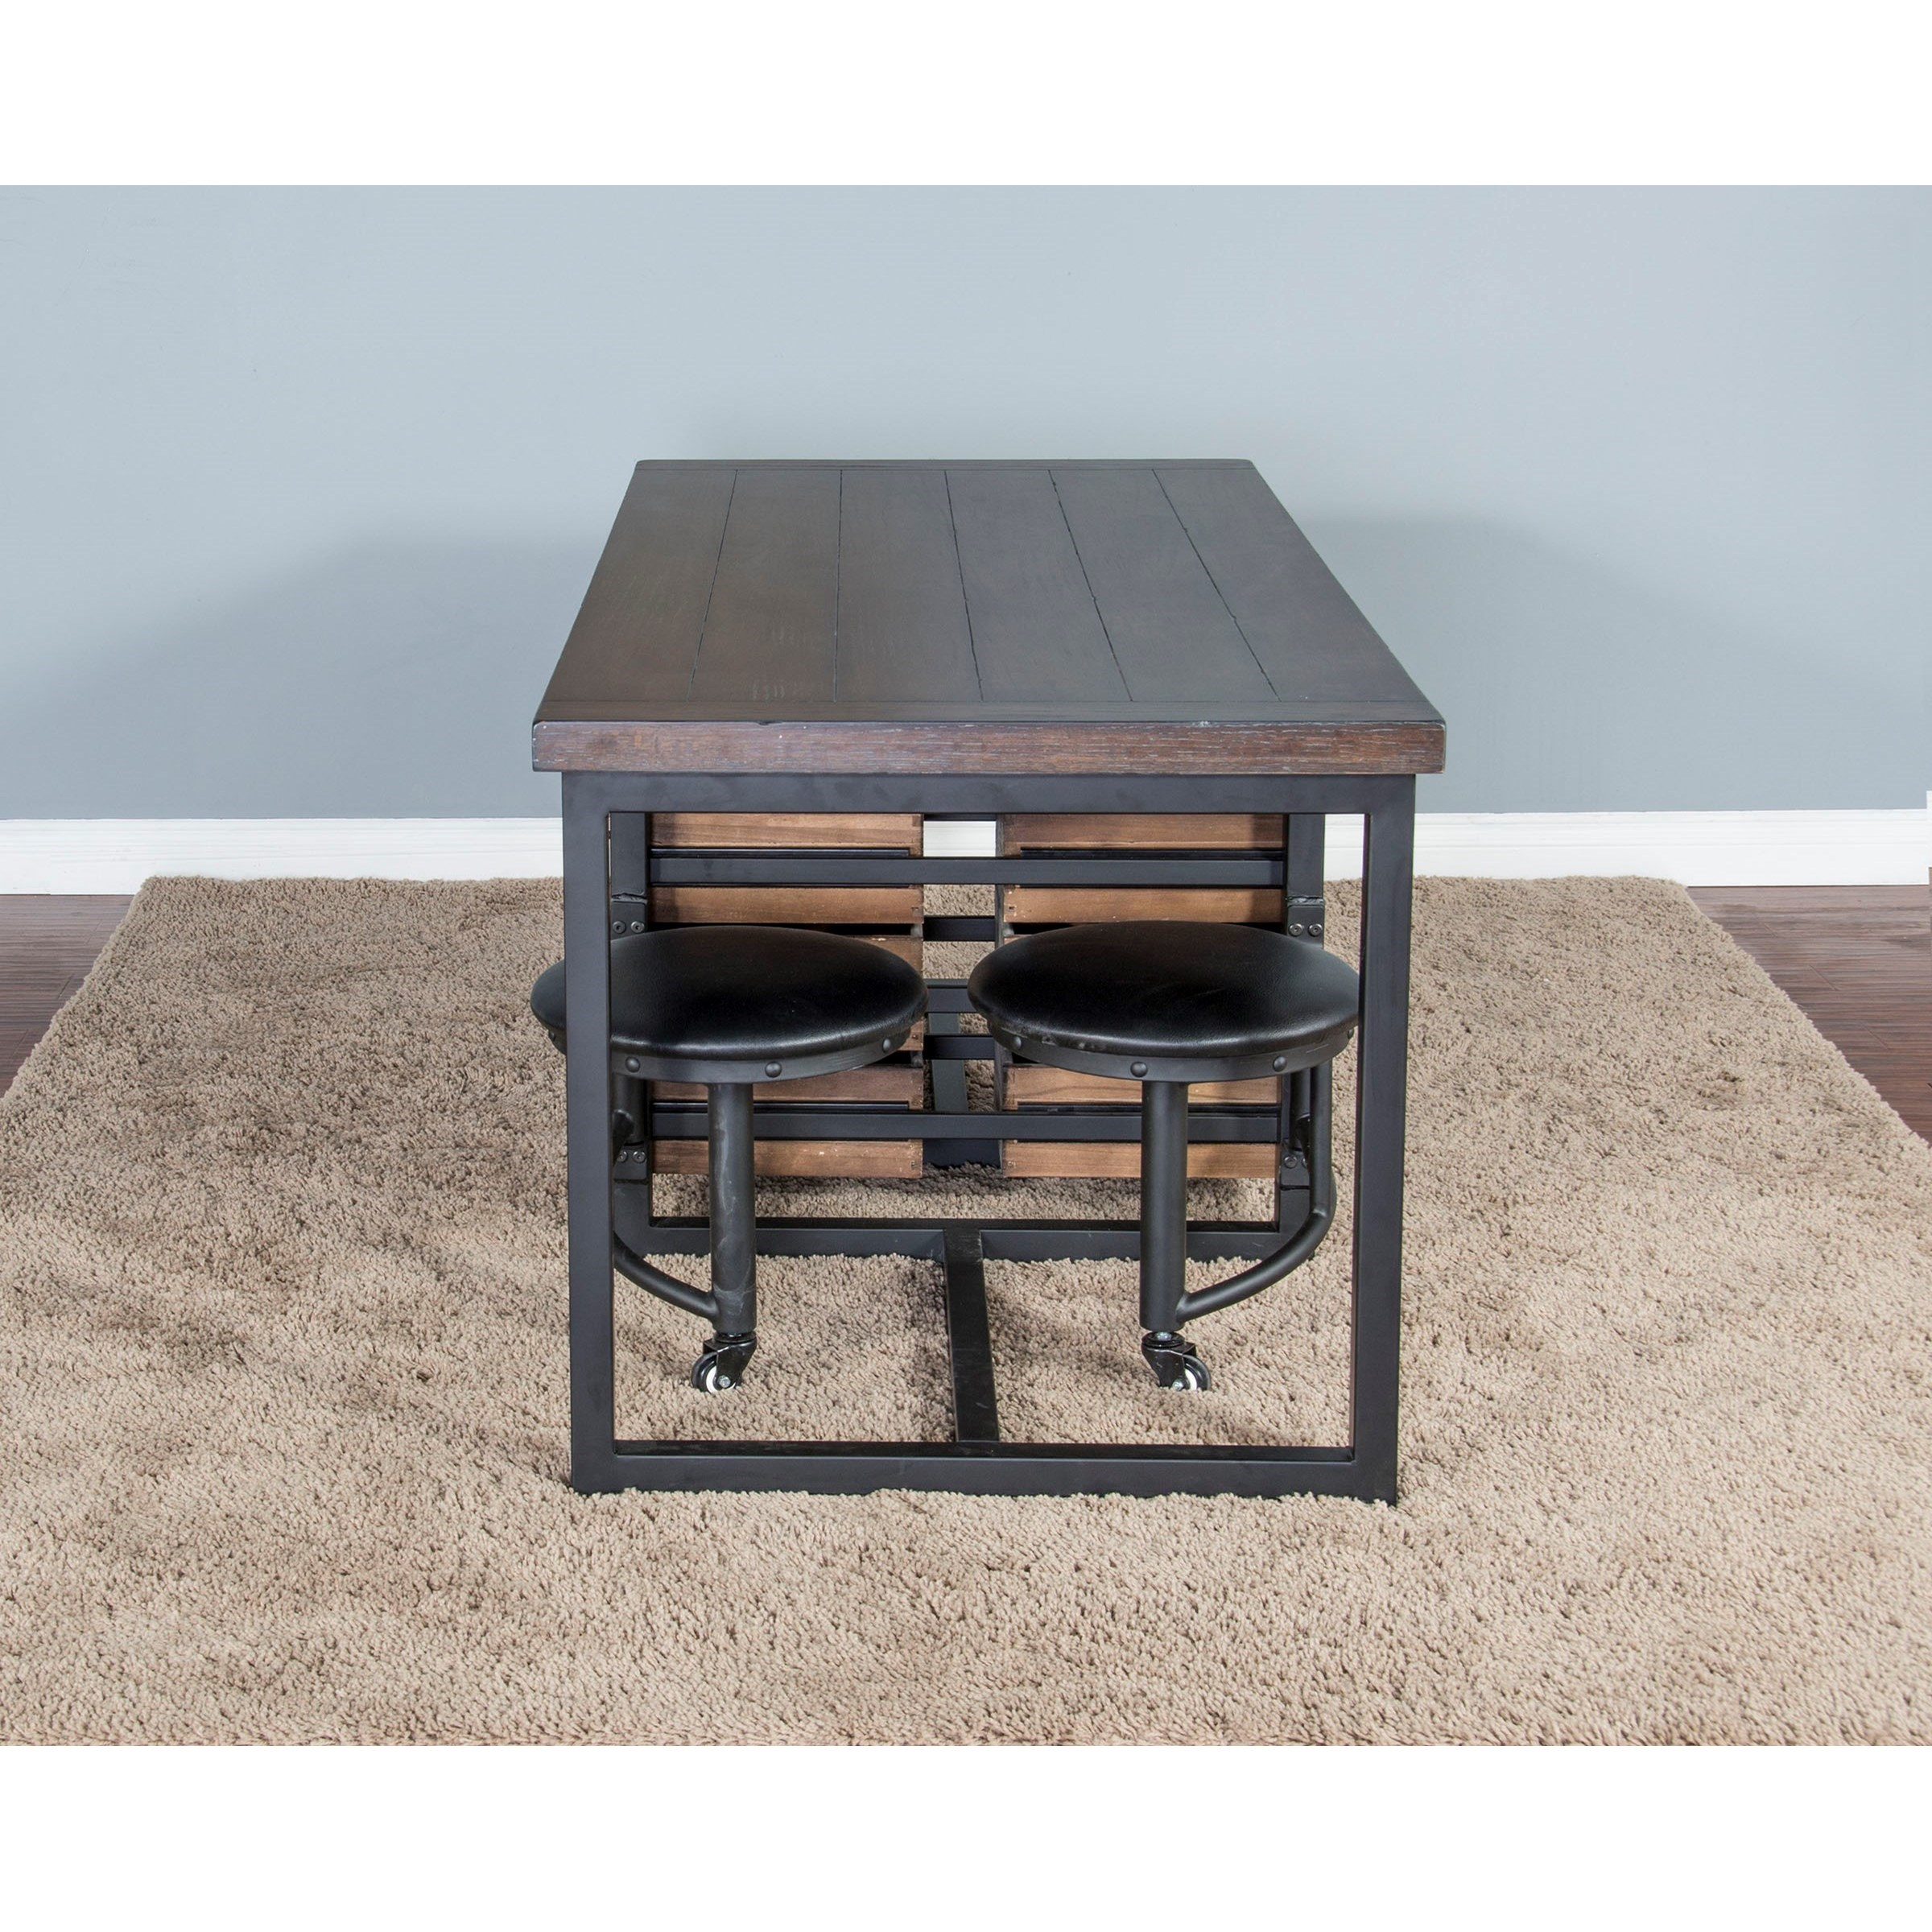 Sunny Designs Metro Flex Industrial 5 Piece Table Set With